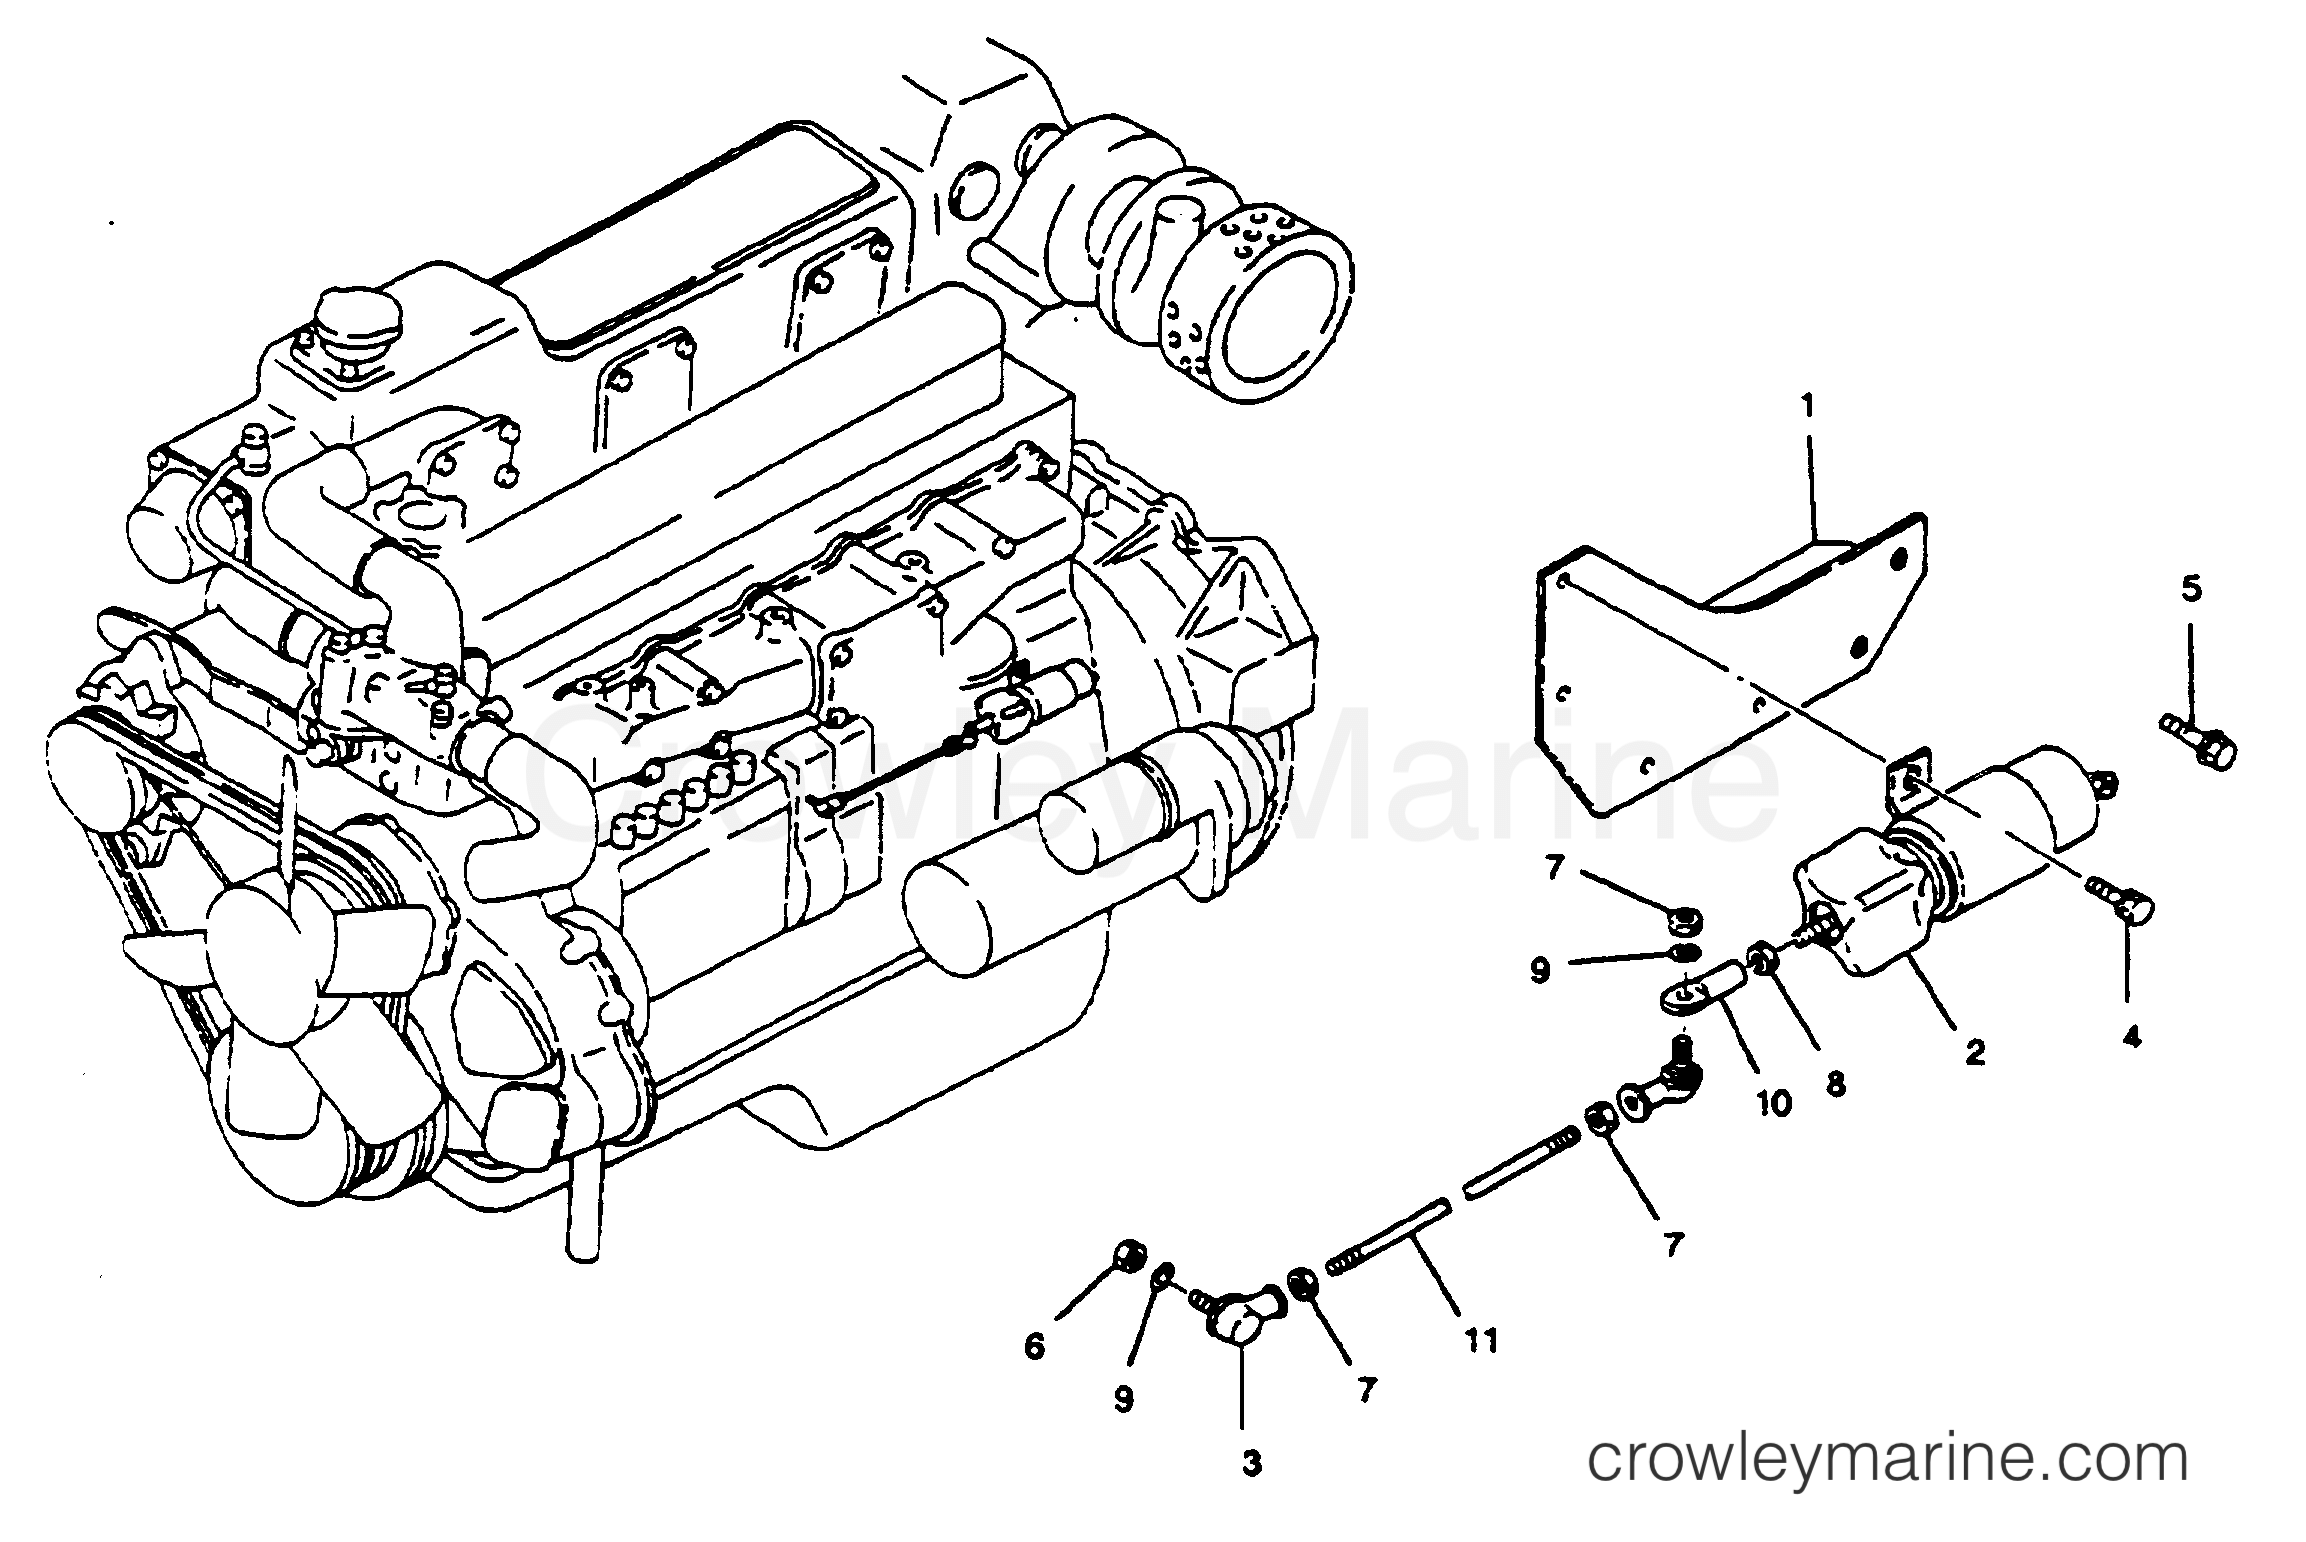 1993 Mercury Inboard Engine 5.8LD [STARBOARD] - 35822D9FS STOP SOLENOID section